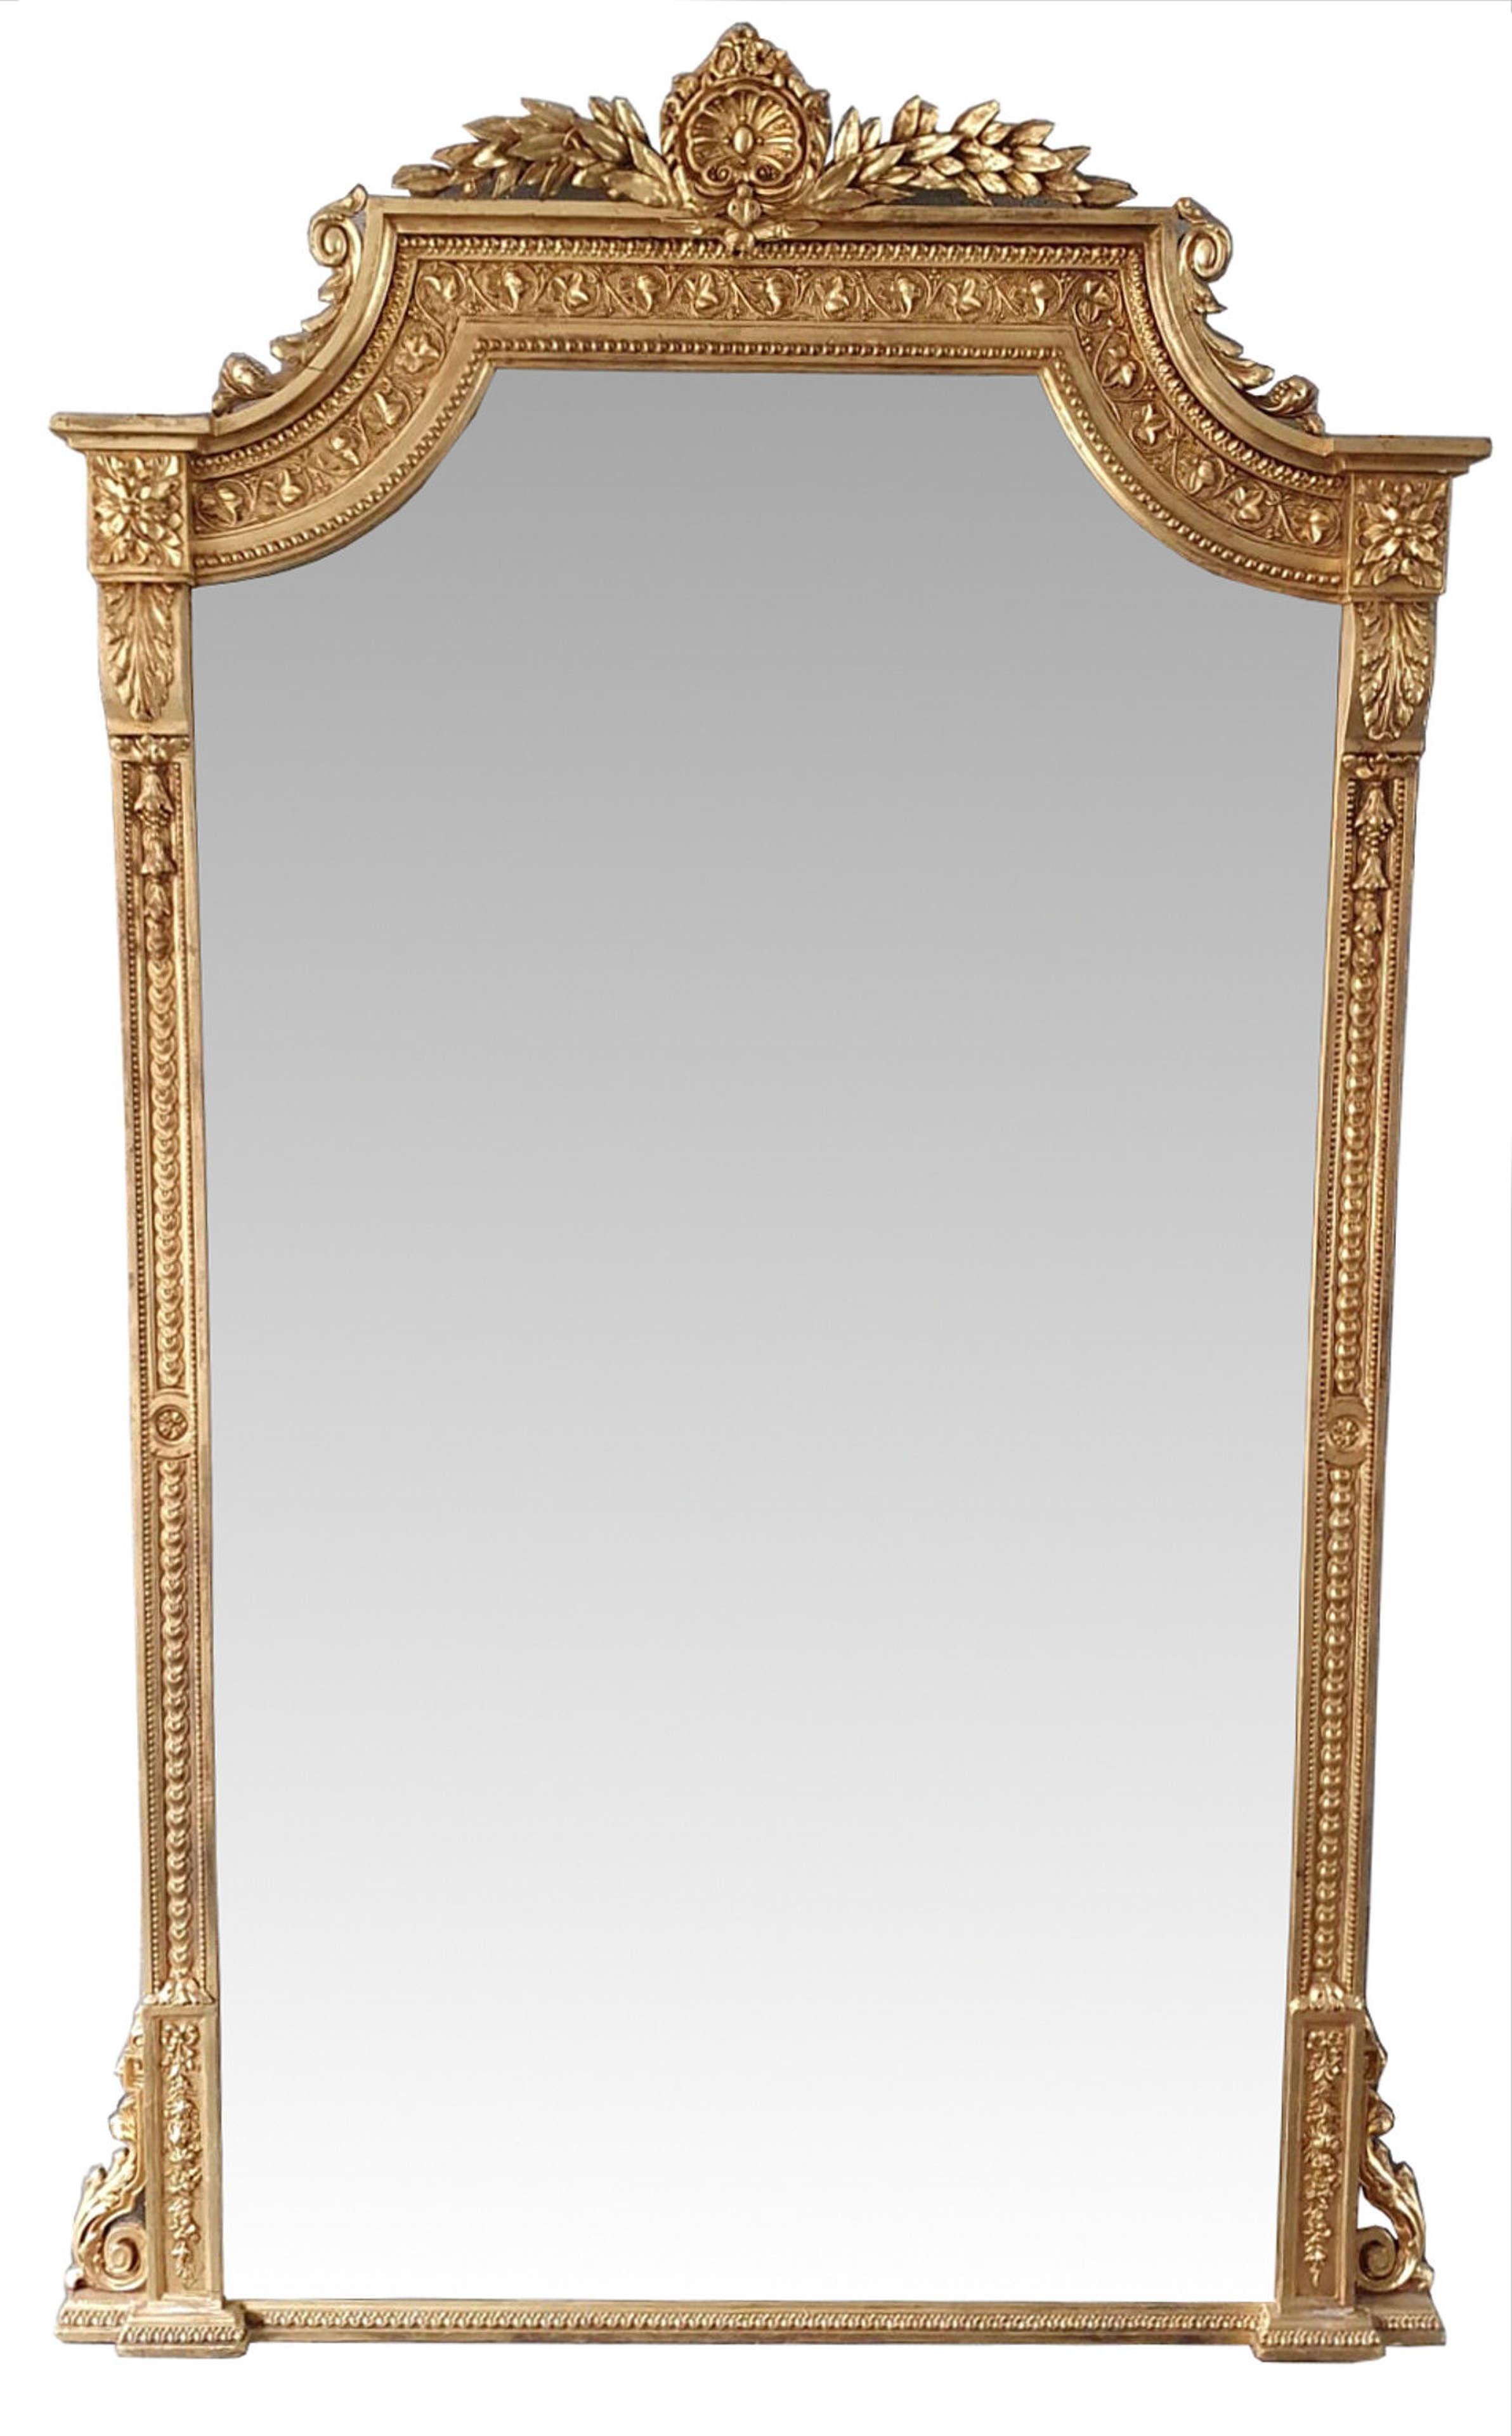 Large 19th Century Gilt Hall or Dressing Mirror